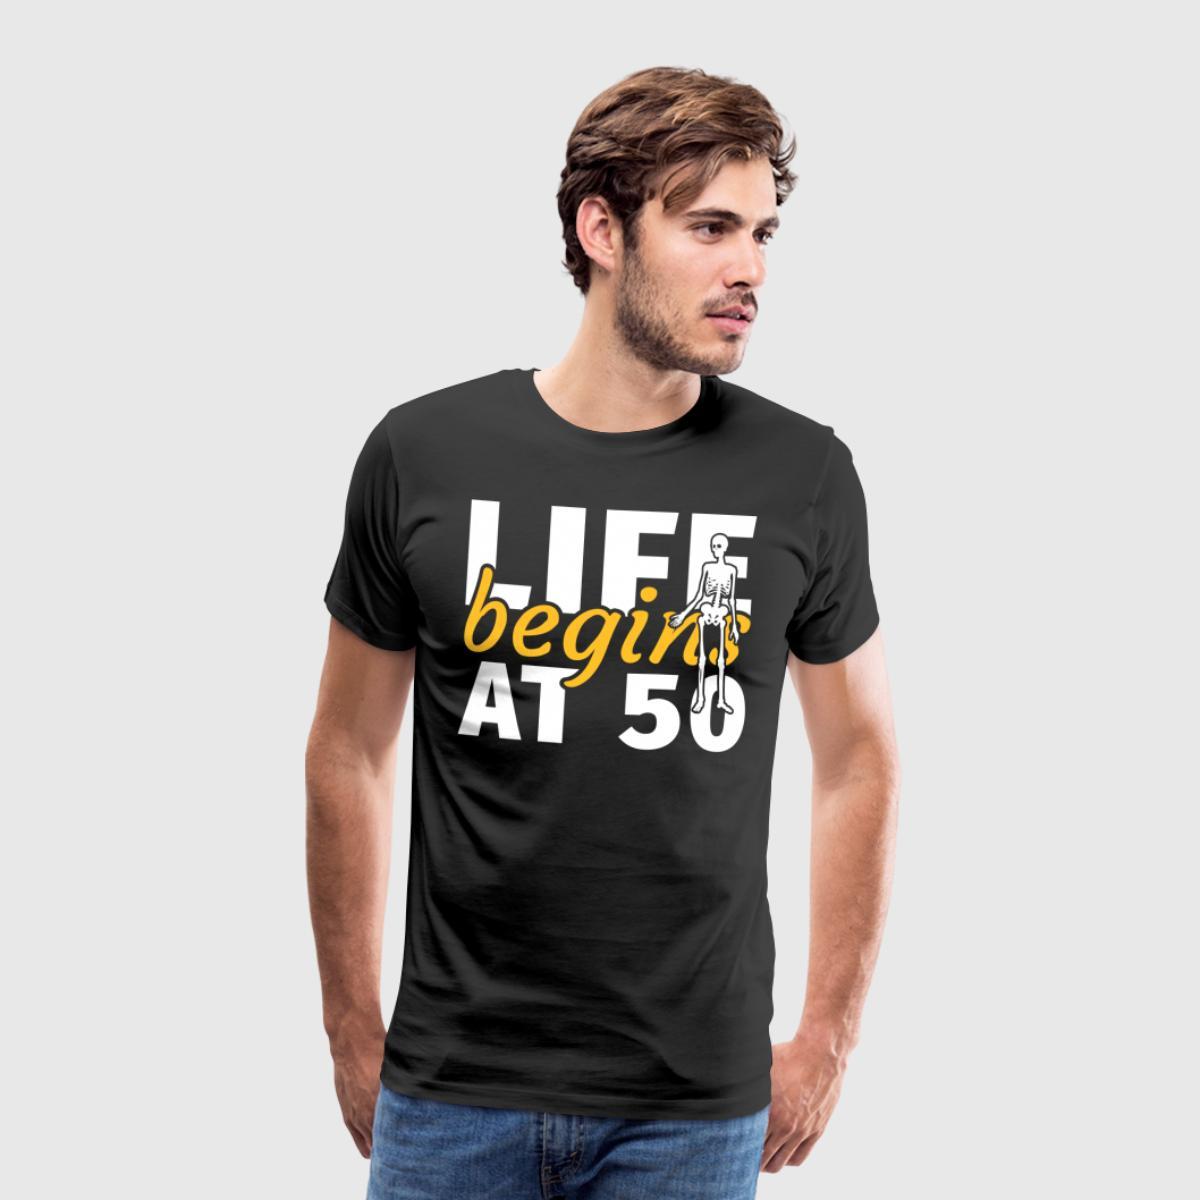 Funny 50th Birthday T Shirt Sayings